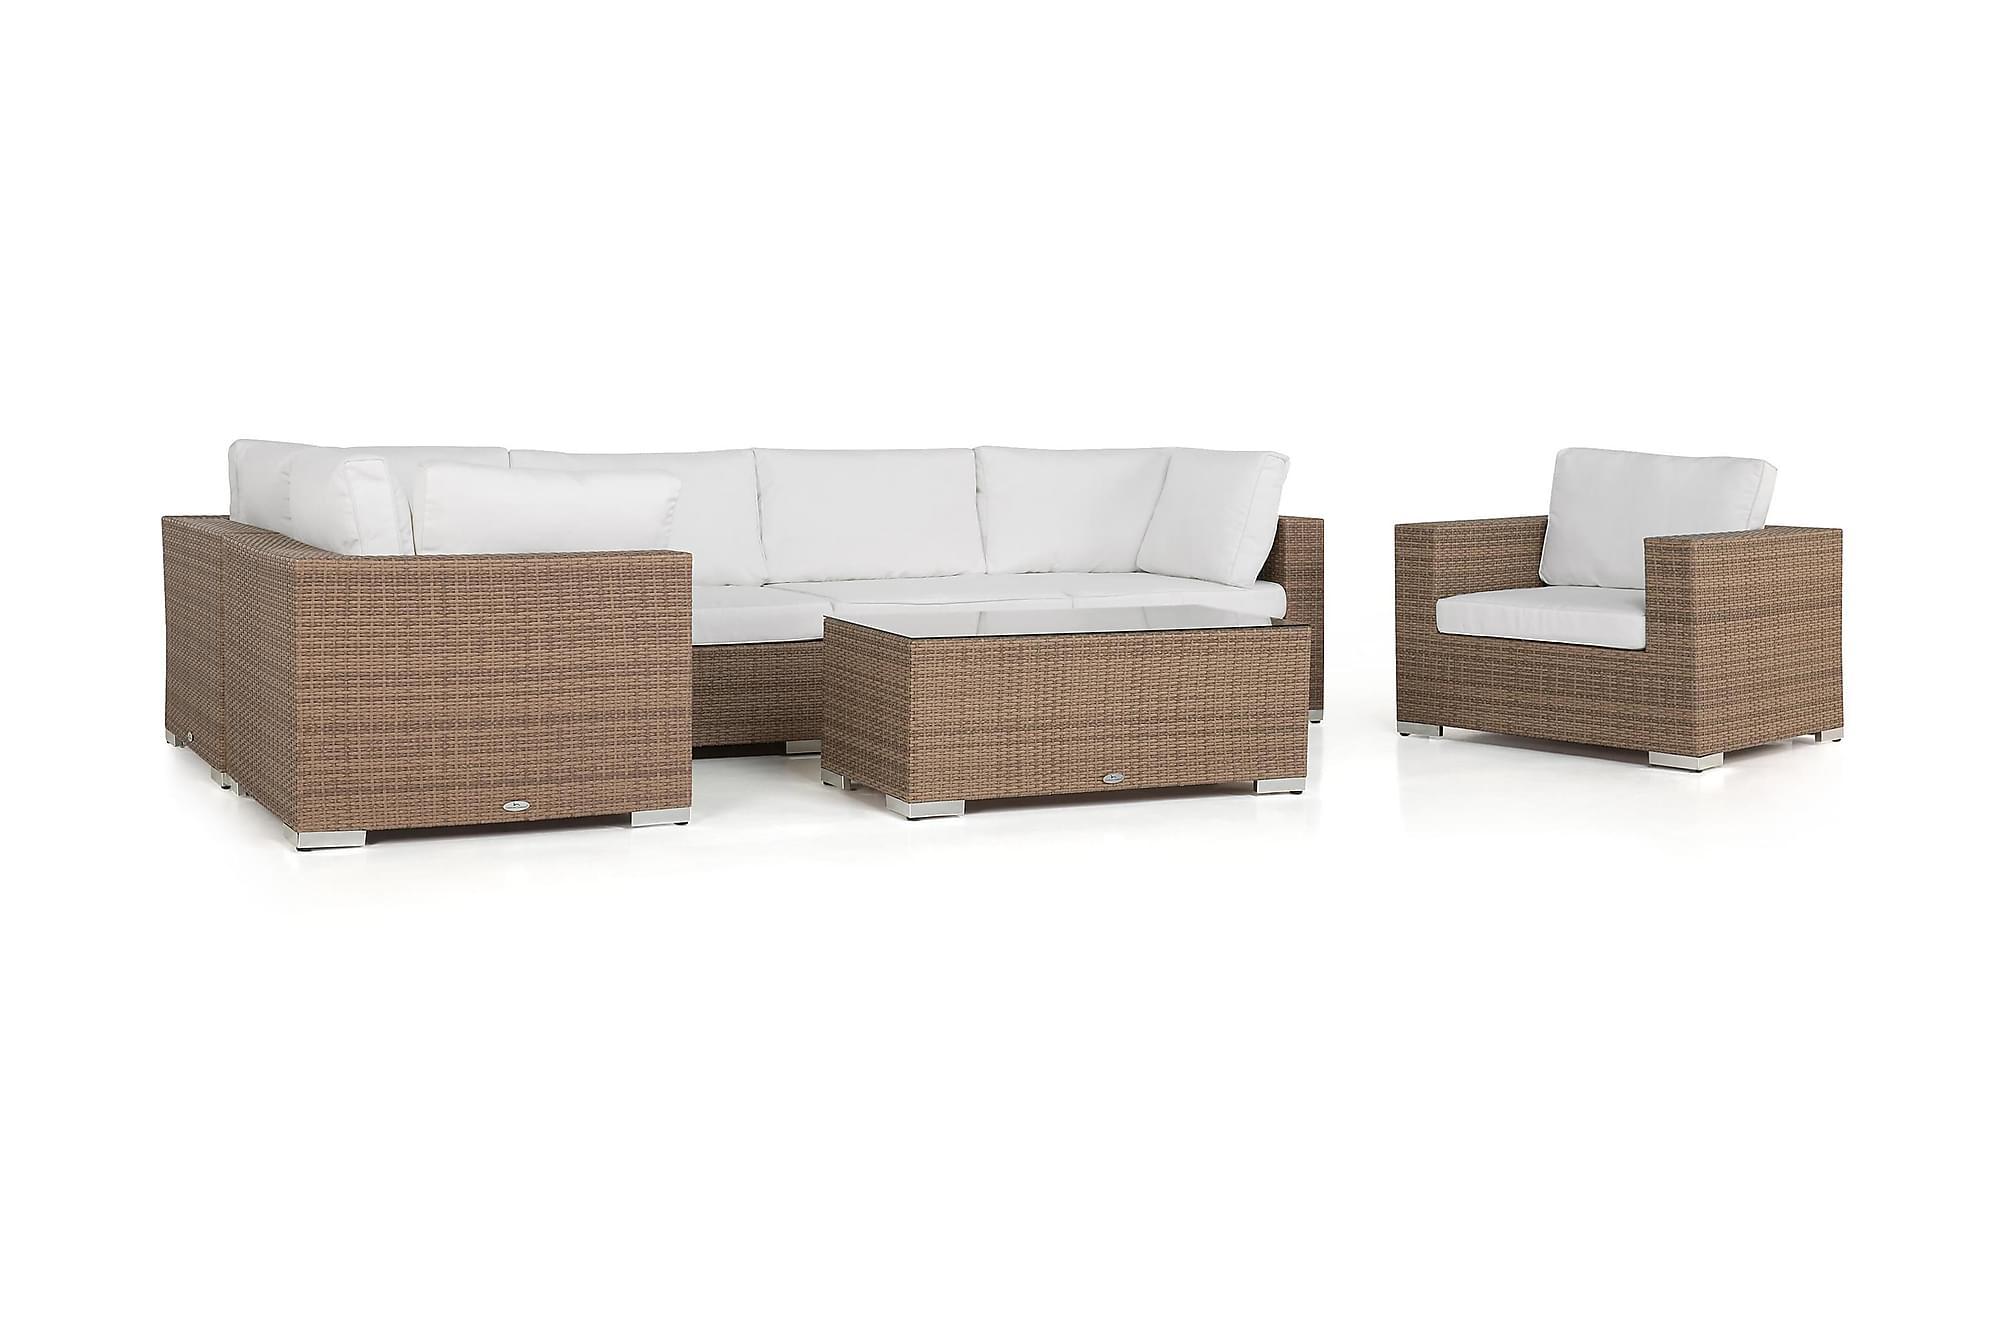 BAHAMAS Loungegrupp Small + Bord + Fåtölj Sand